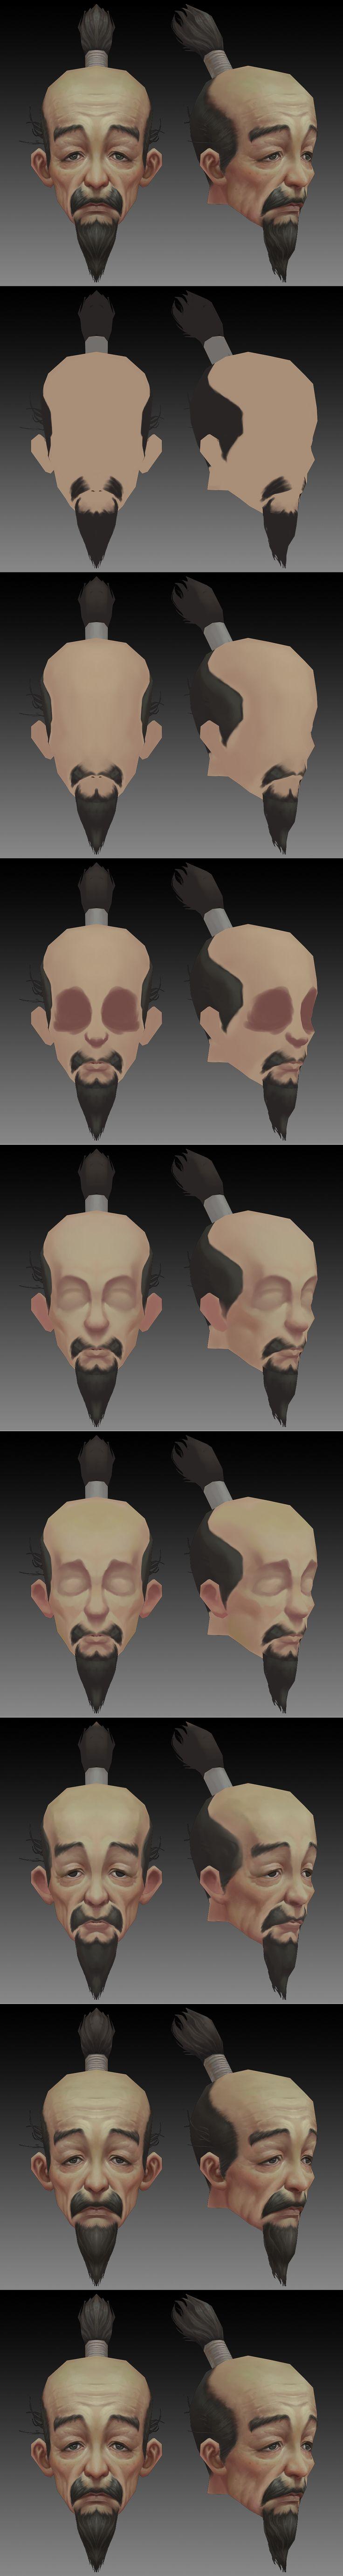 Face - Steps